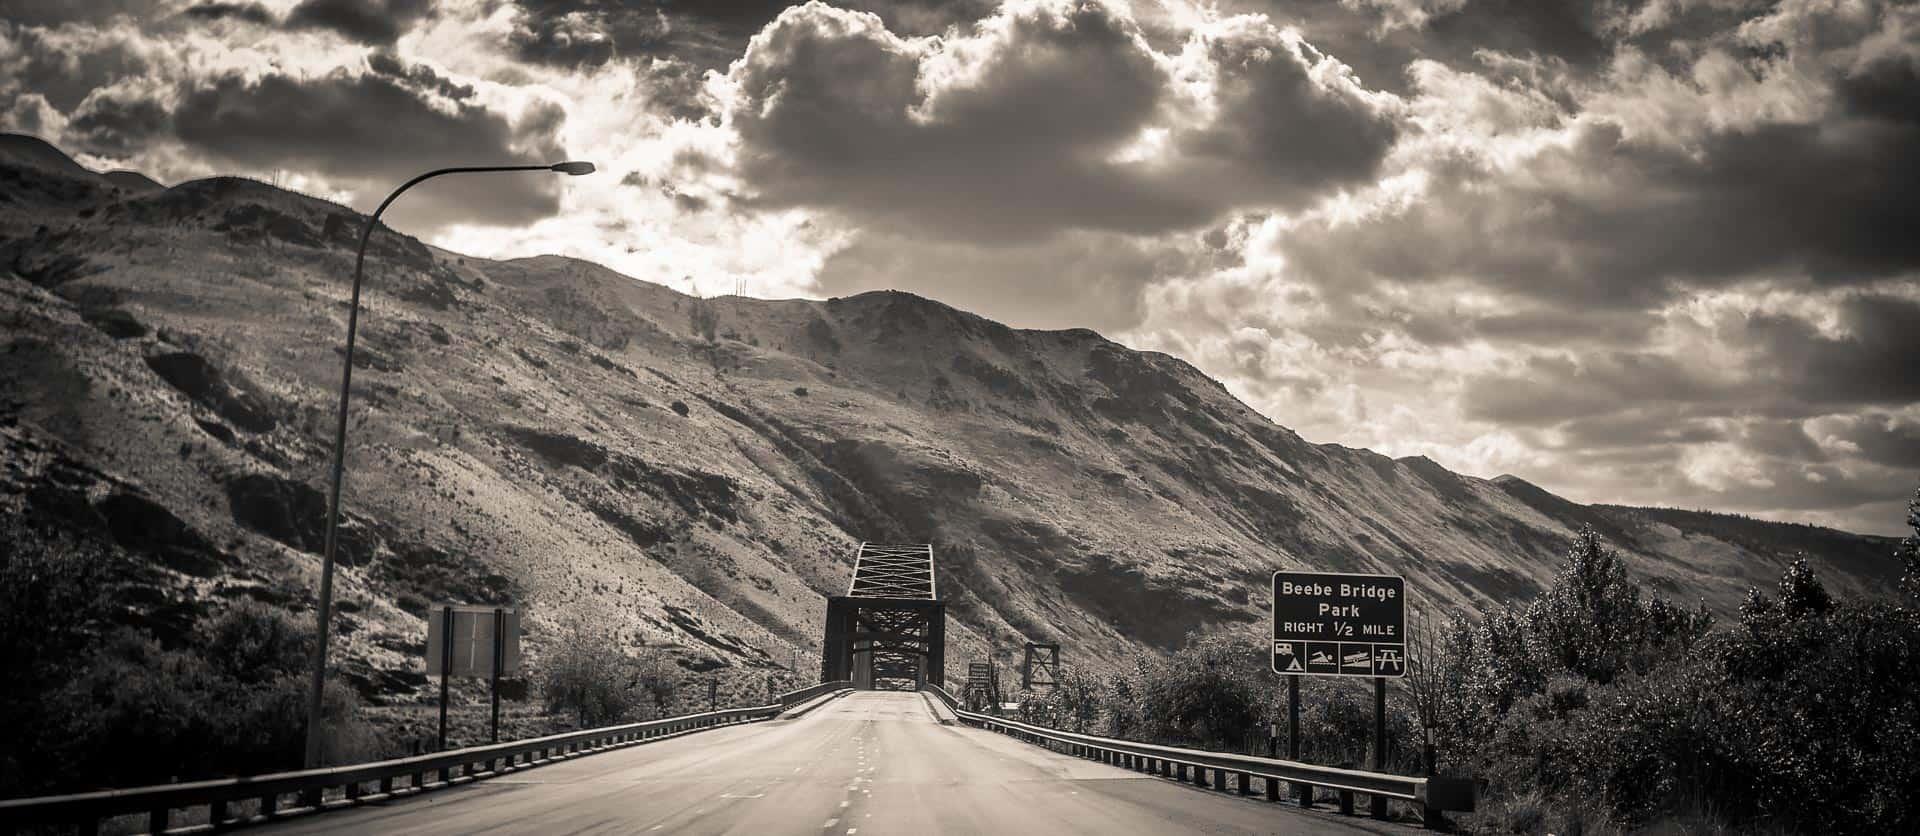 Beebe Park Washington State Road Trip Photography